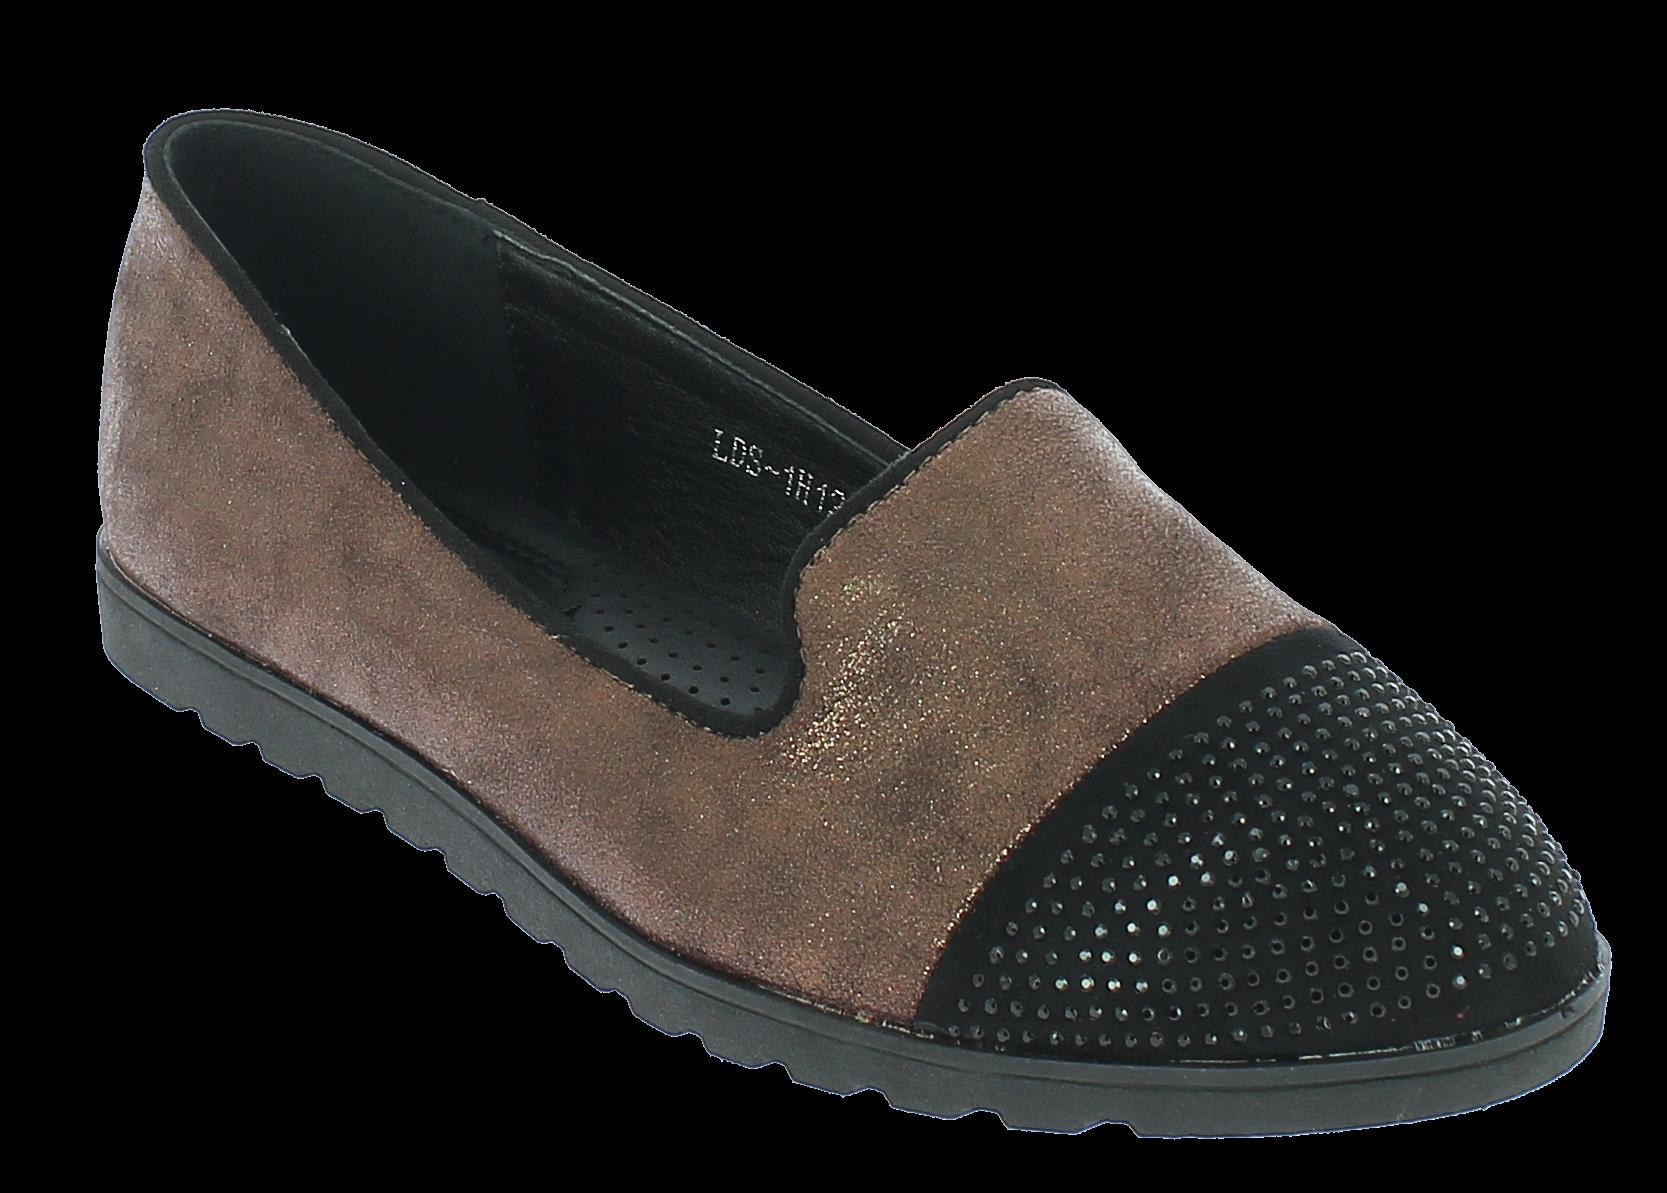 IQSHOES Γυναικεία Μπαλαρίνα 1H129 Μπρονζέ - IqShoes - 1H129 BRONZE-bronze-36/1/3 παπούτσια  new in